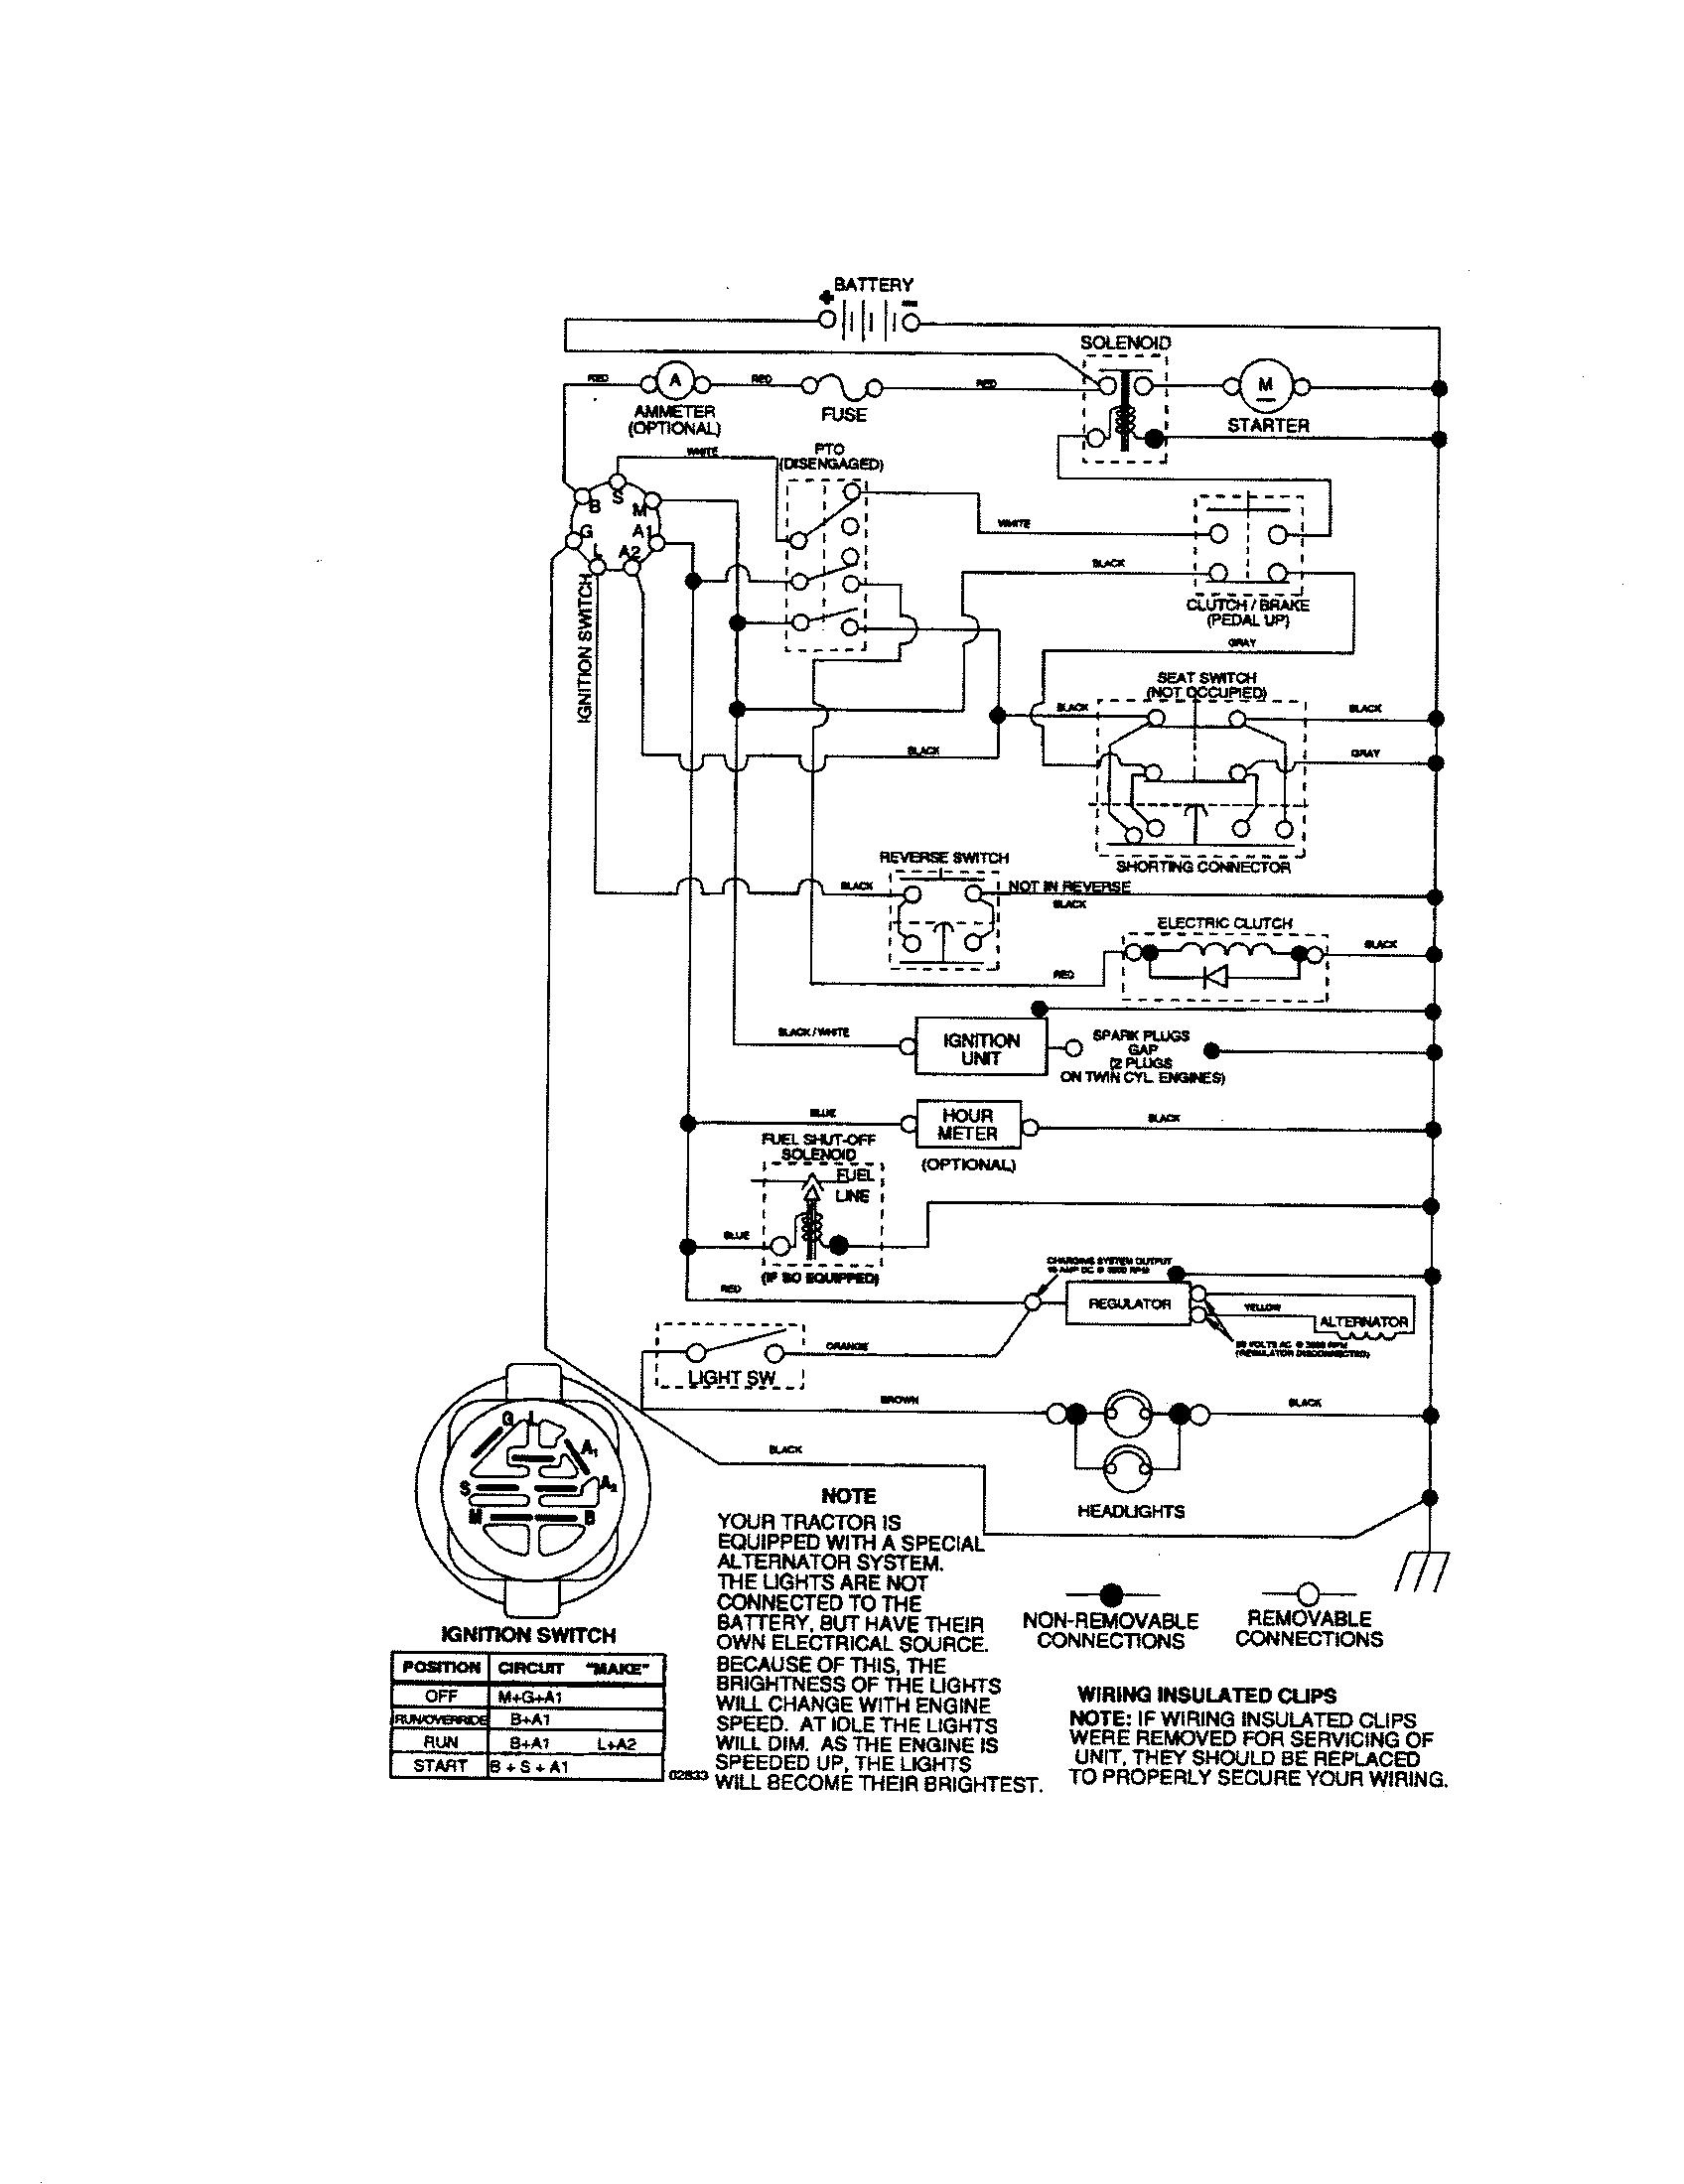 toro lawn mower wiring diagram toro mower wiring diagram wiring diagram data  toro mower wiring diagram wiring